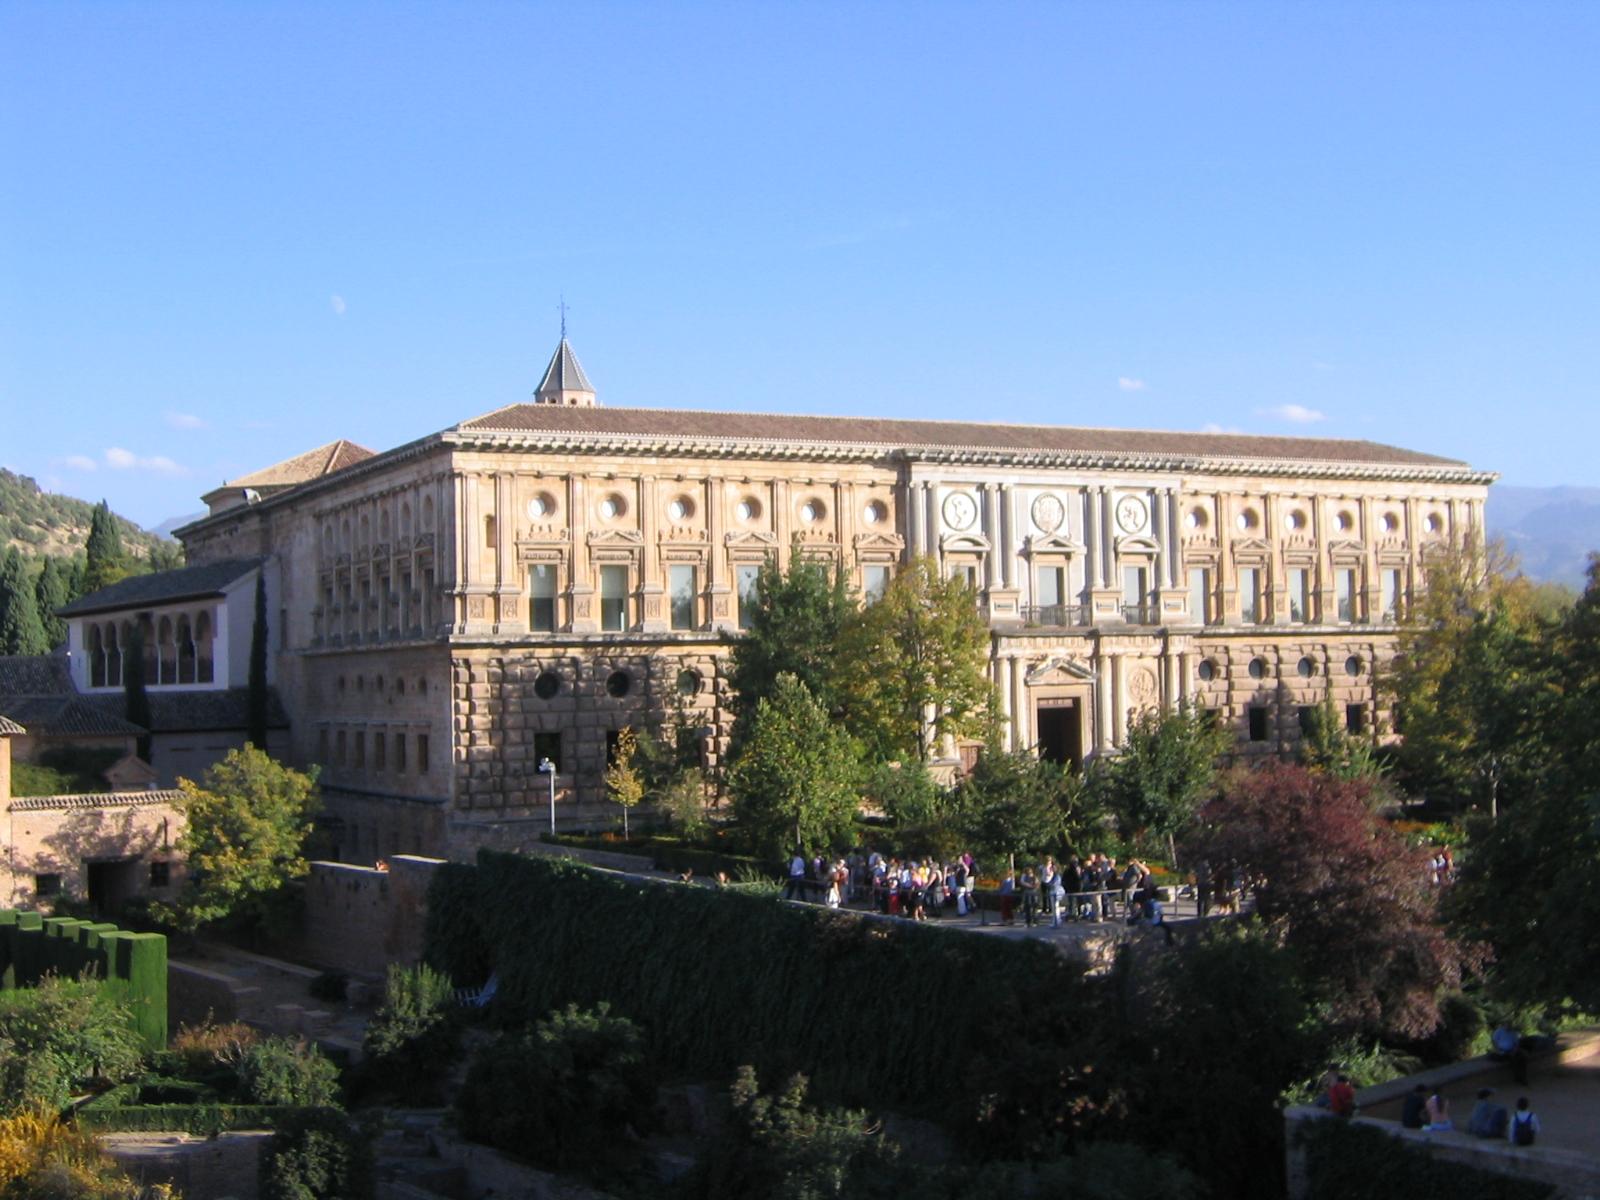 File:Palacio Carlos V west.jpg - Wikimedia Commons